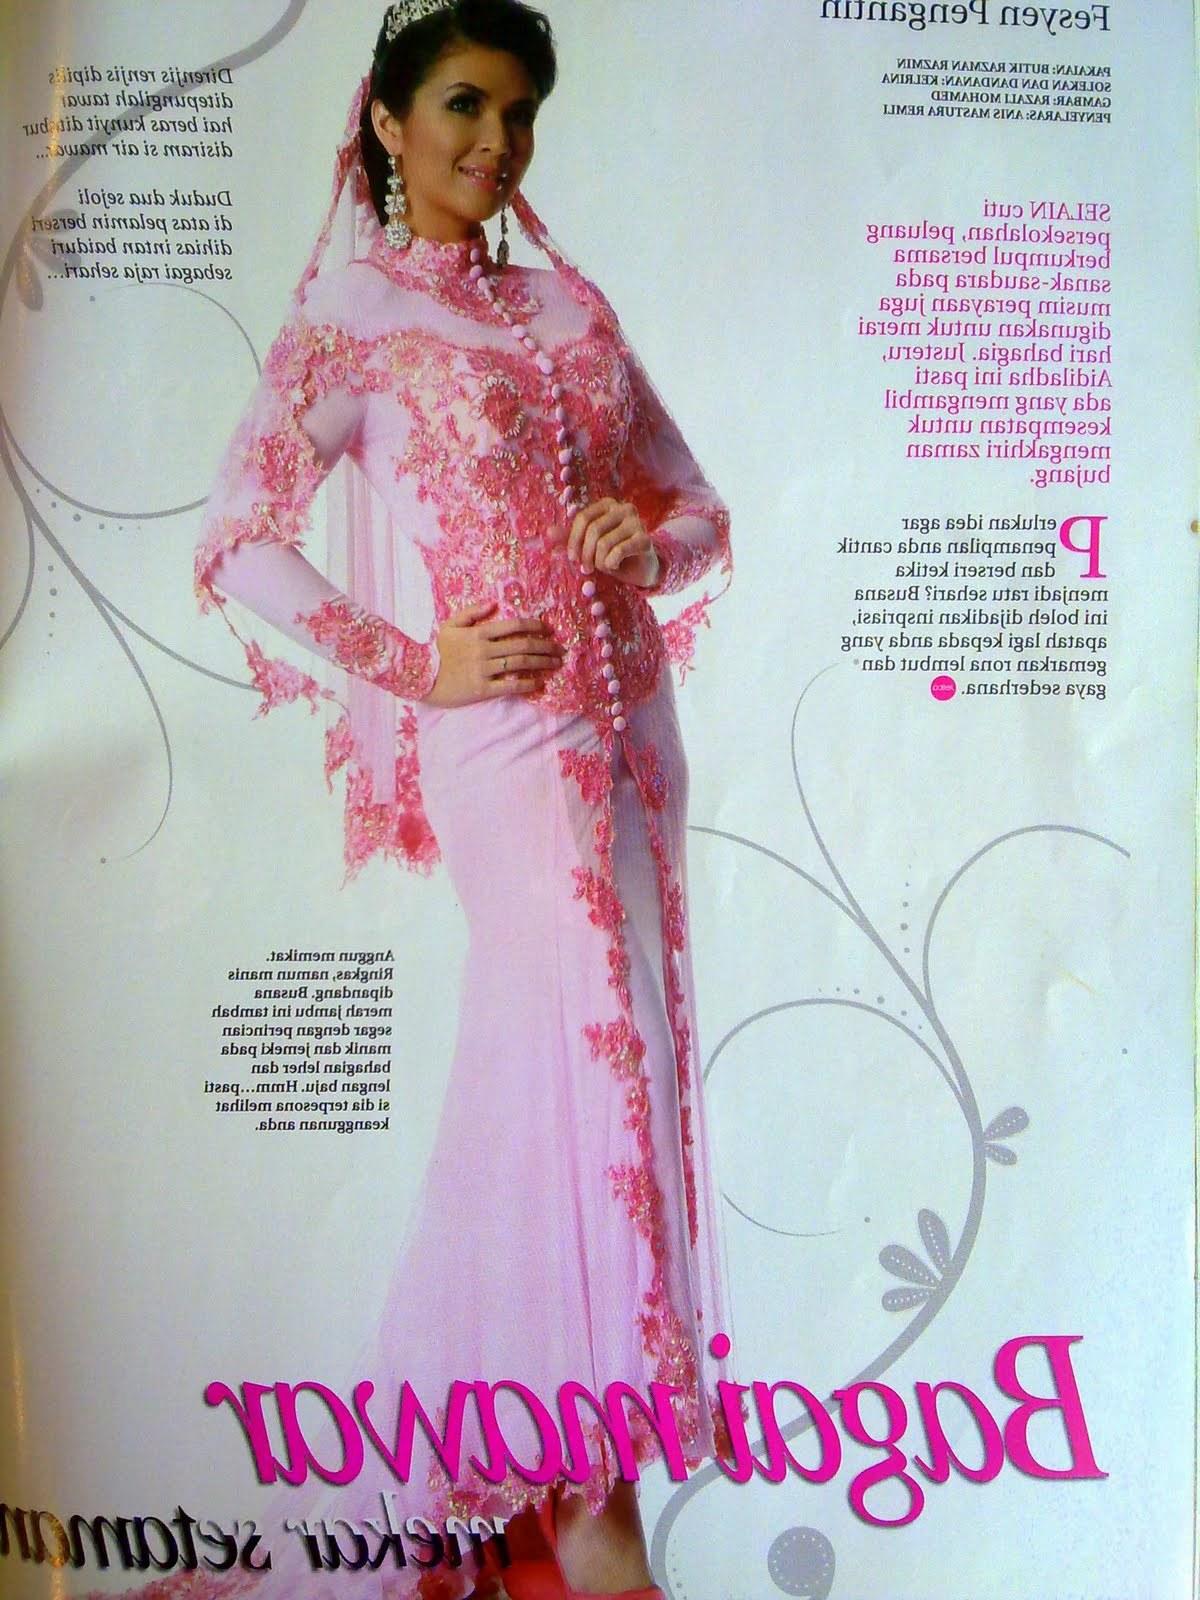 Design Gaun Pengantin Muslim Cantik Ipdd Wynn Nasution 2010